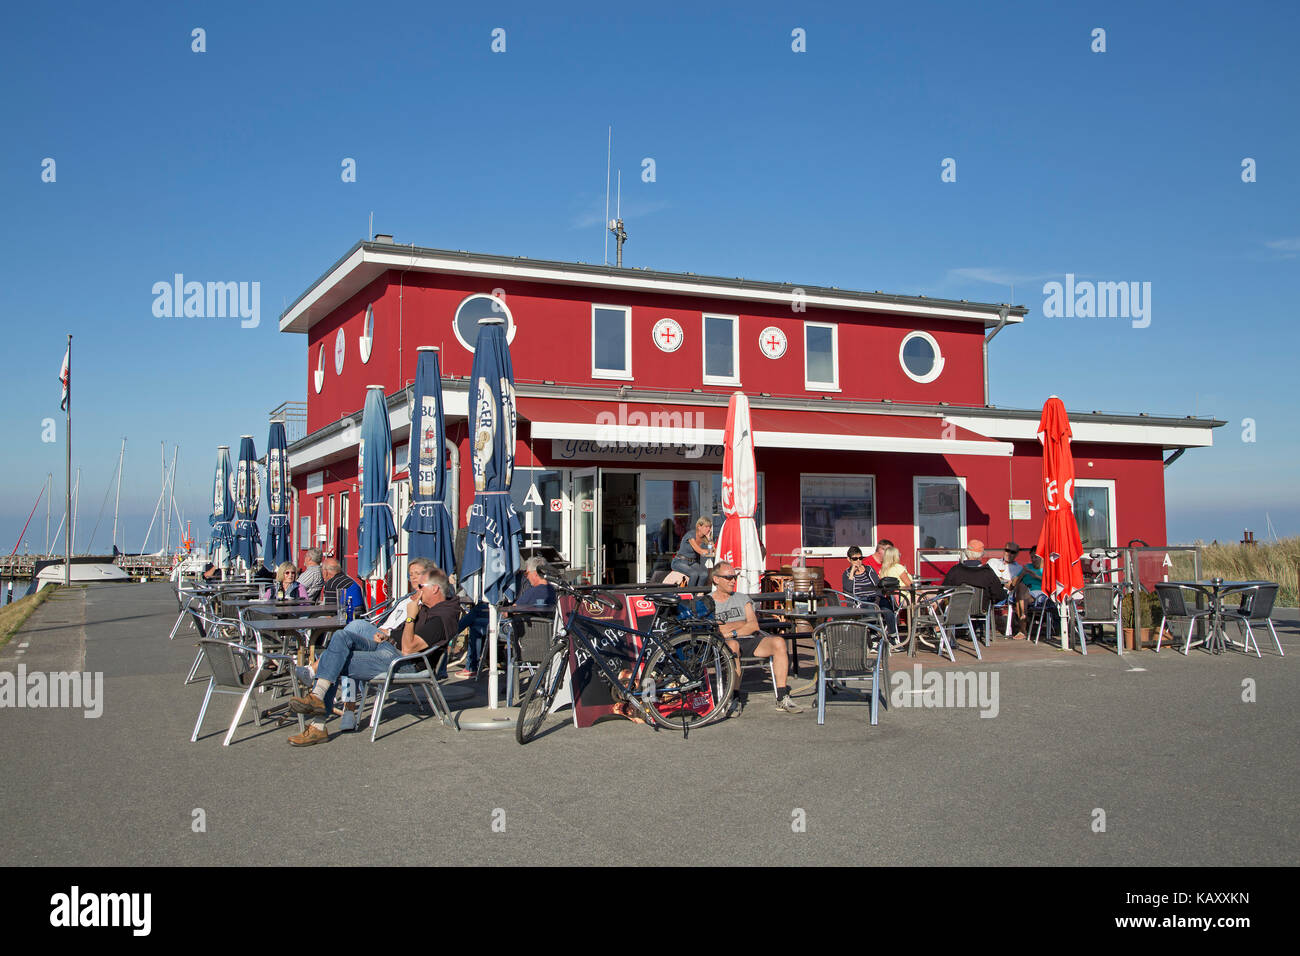 marina bistro, Baltic Sea Spa Damp, Schleswig-Holstein, Germany - Stock Image